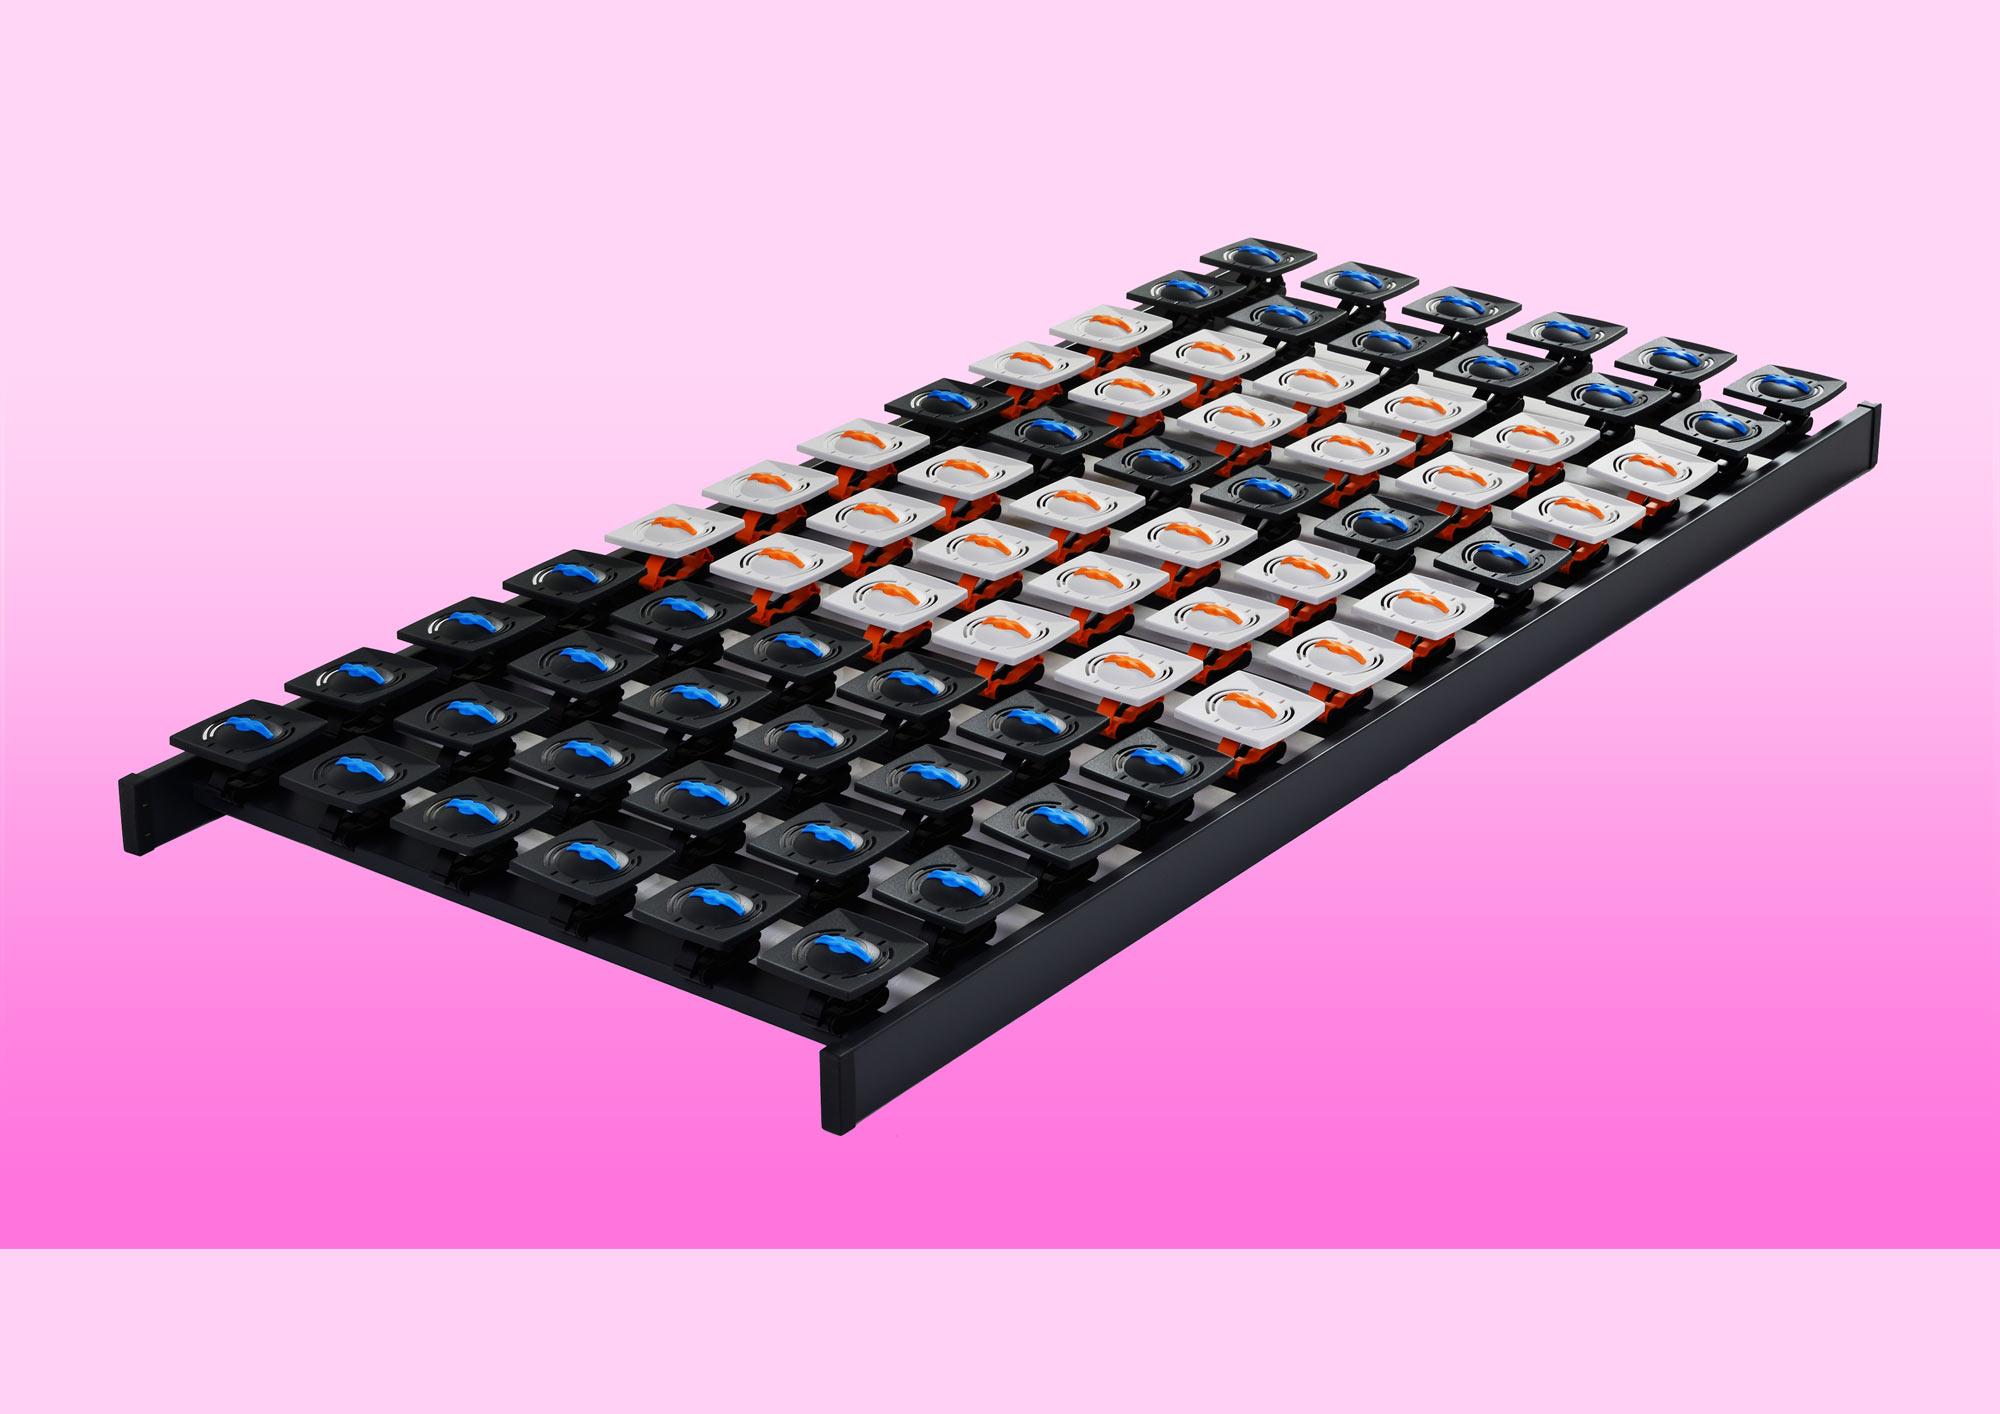 lattenrahmen lattenrost tellerrahmen tellerrost 100 x 200 100x200 cm dream. Black Bedroom Furniture Sets. Home Design Ideas